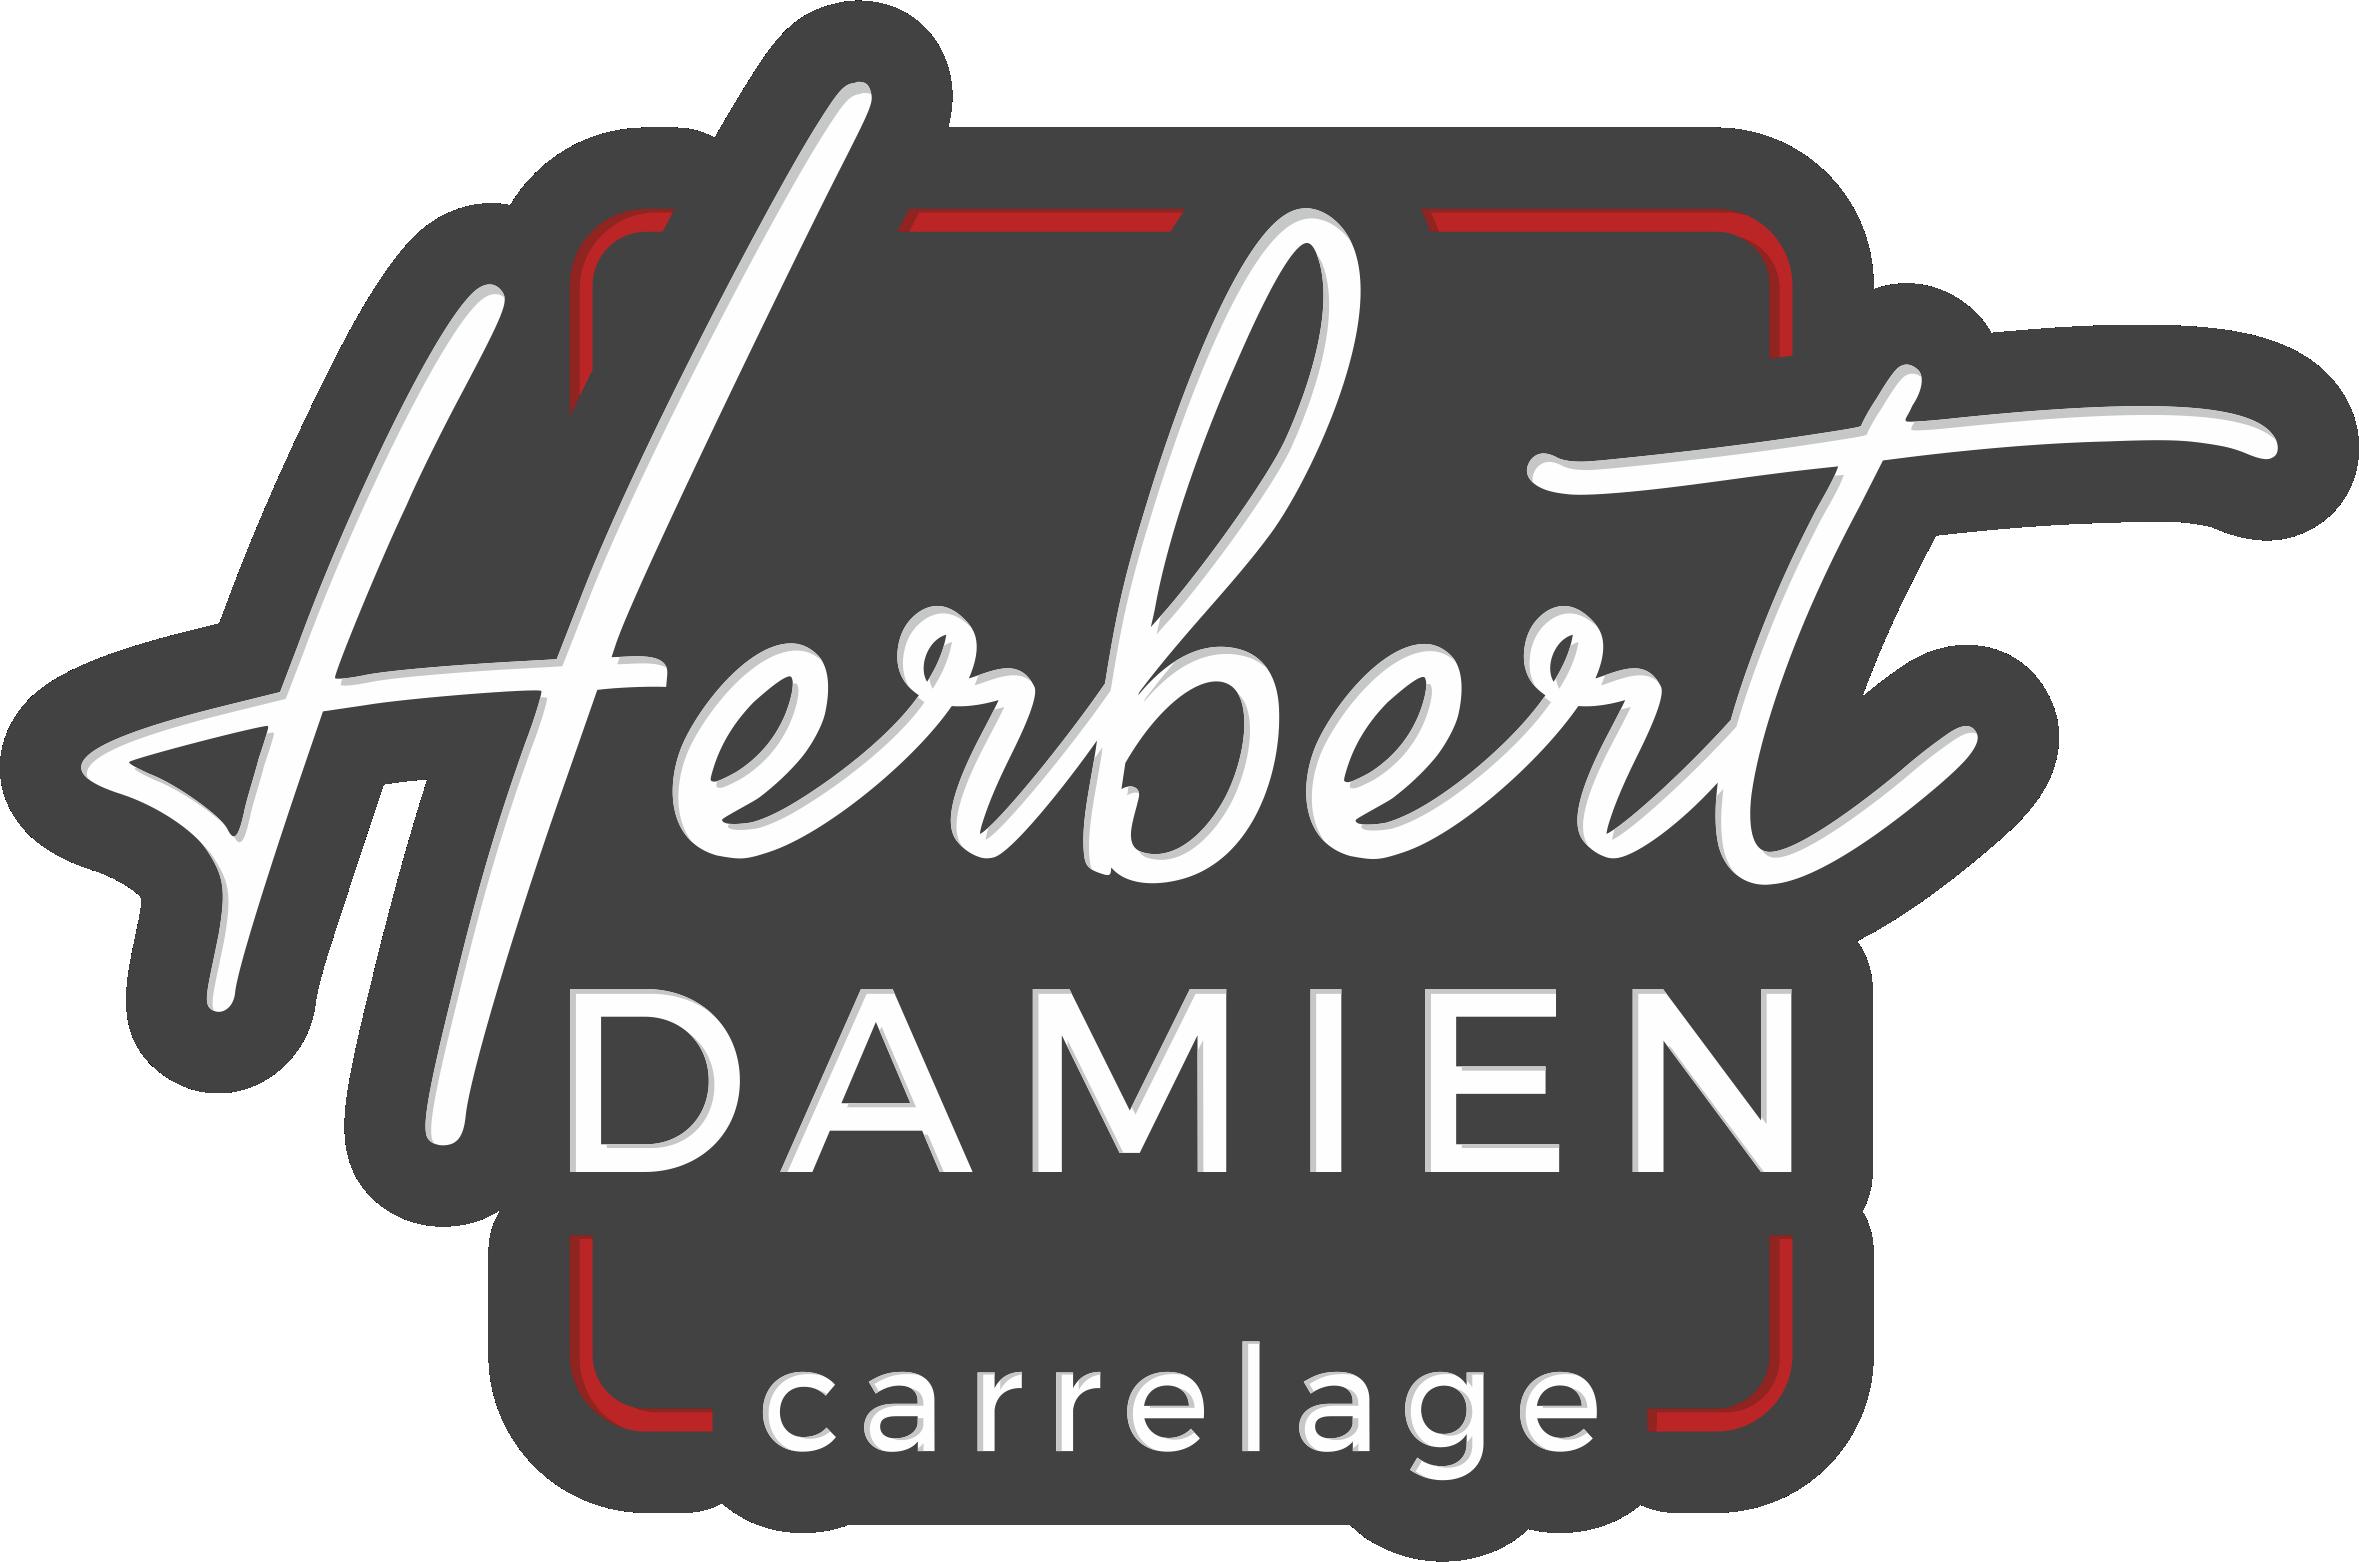 Herbert damien, carreleur Falleron